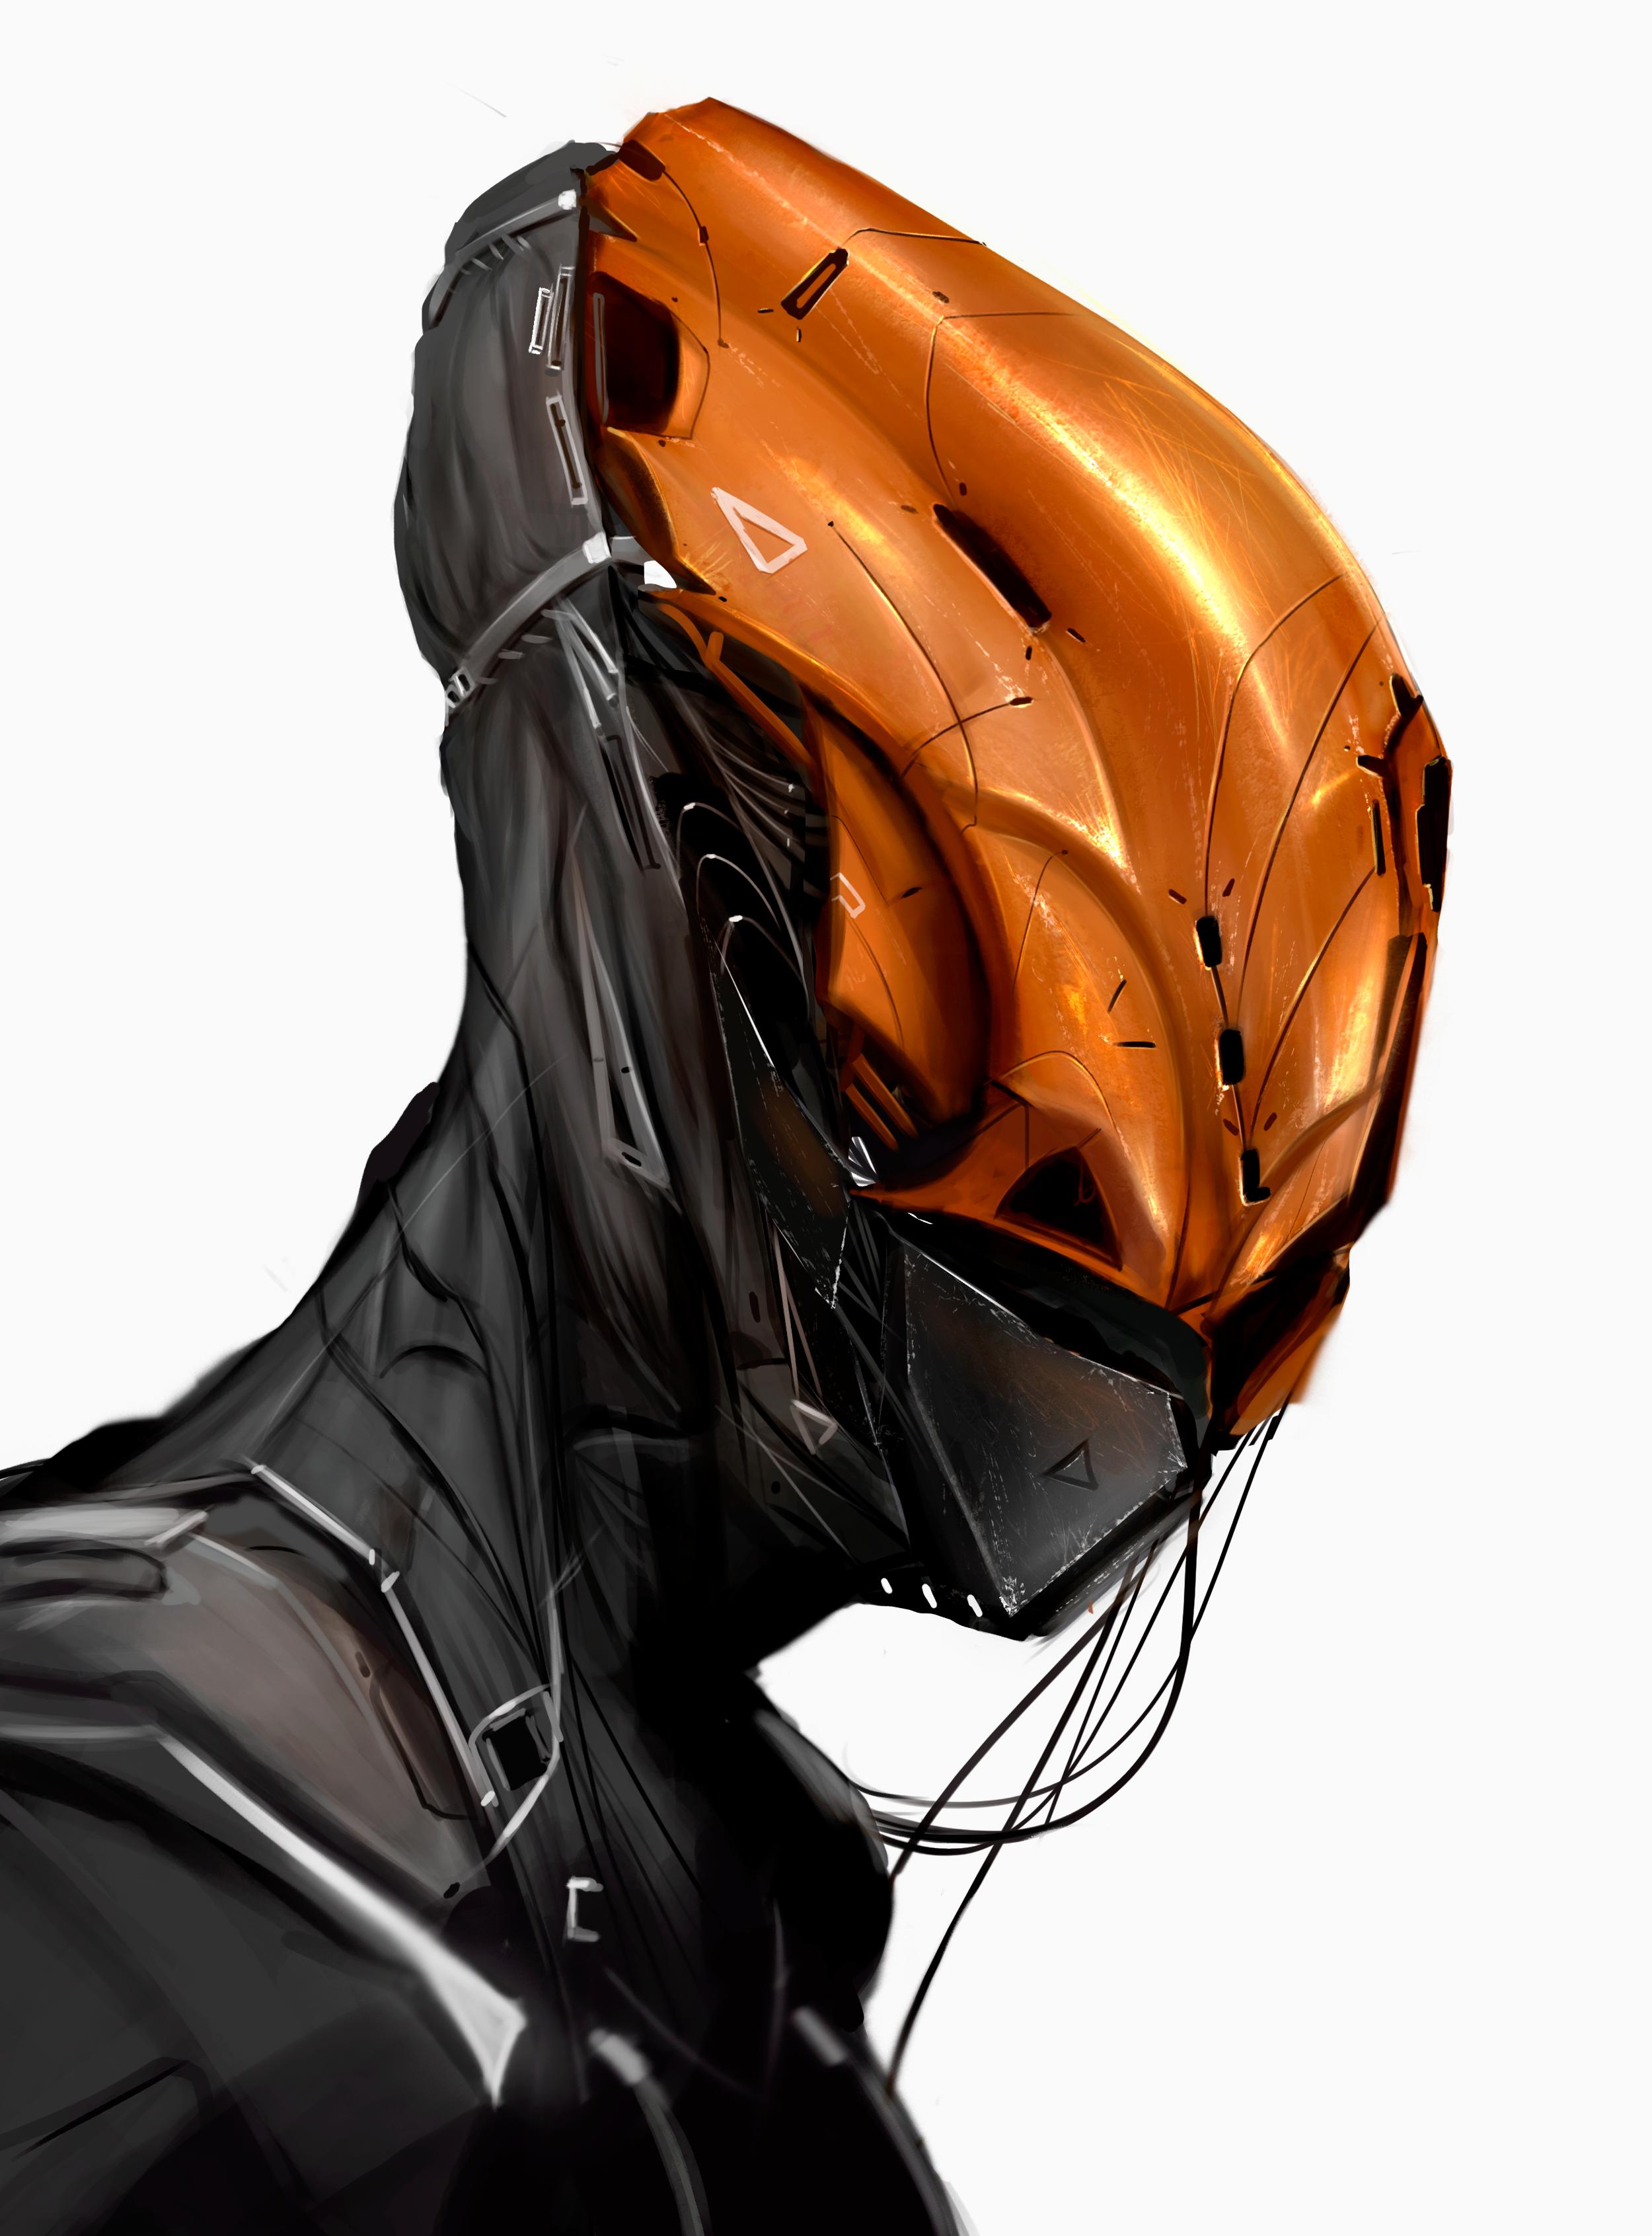 Futuristic Armor Design By Oskar Woinski Futuristic Armour Cyborgs Art Concept Art Characters